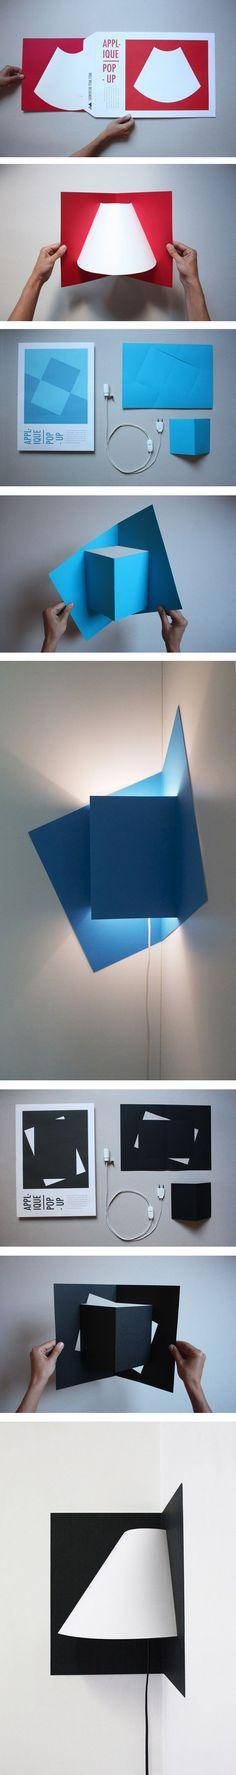 luz de esquiNa despLegable / pop-up corNer lighT, Well Well Designers.: